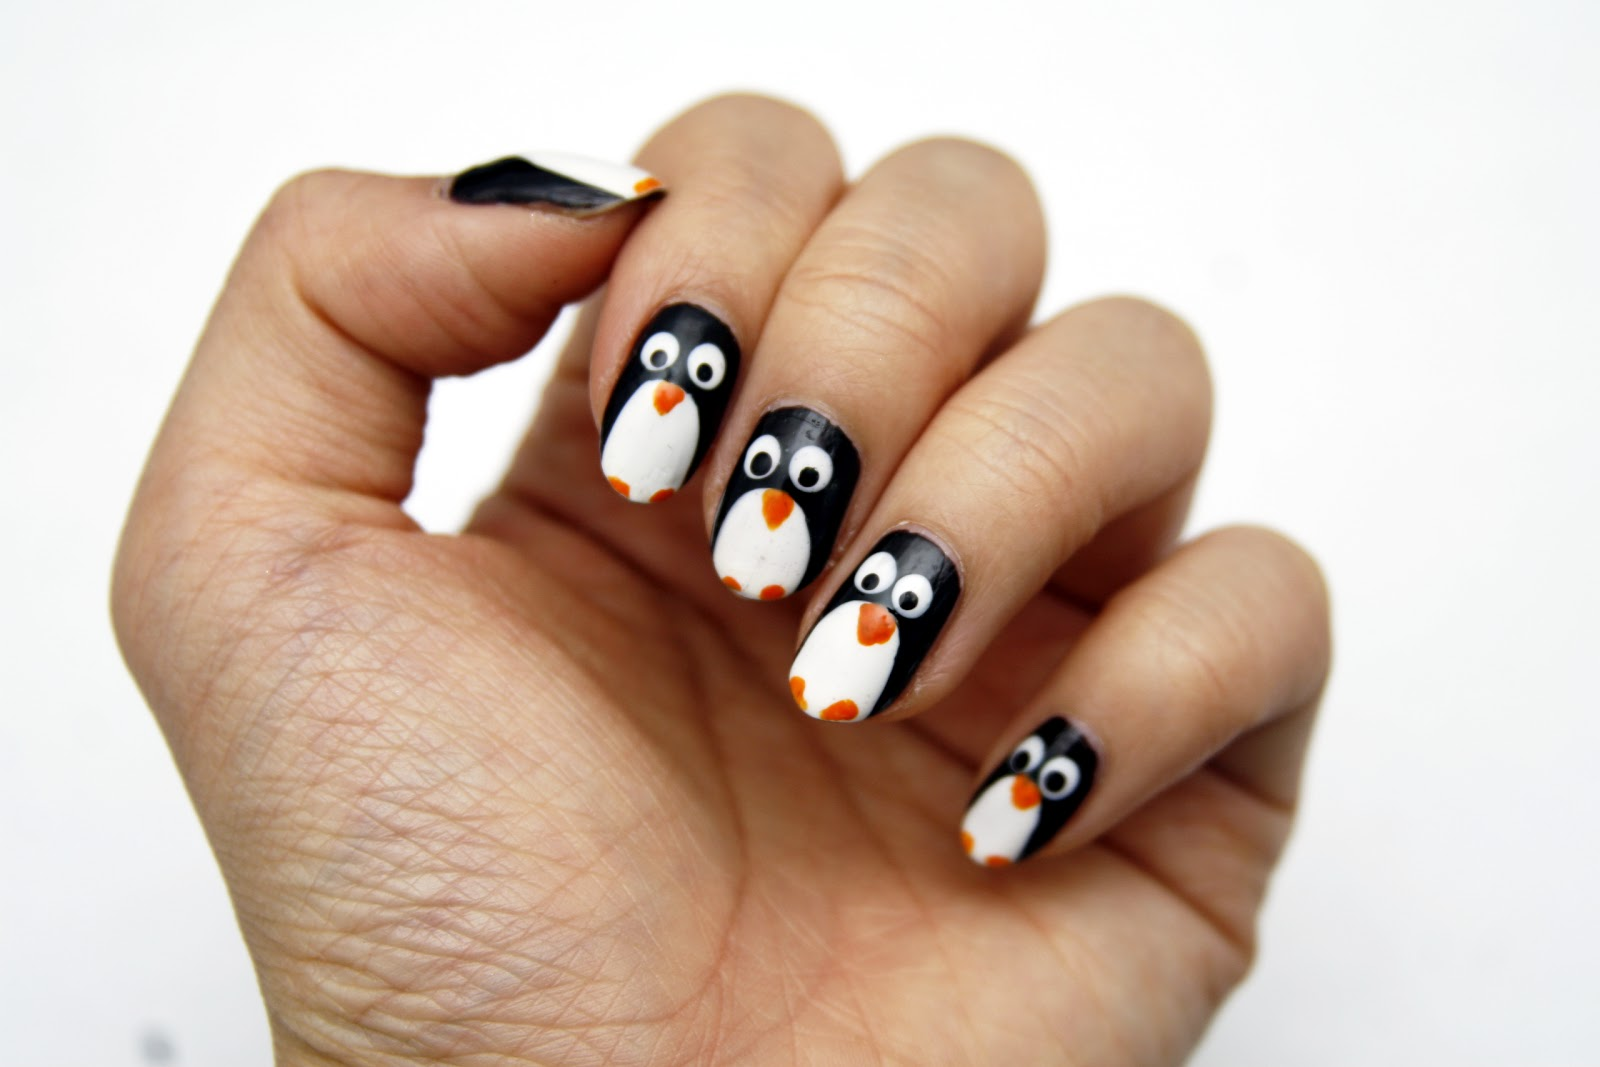 fun size beauty: #ManiMonday - Penguin Nail Art // Holiday ...